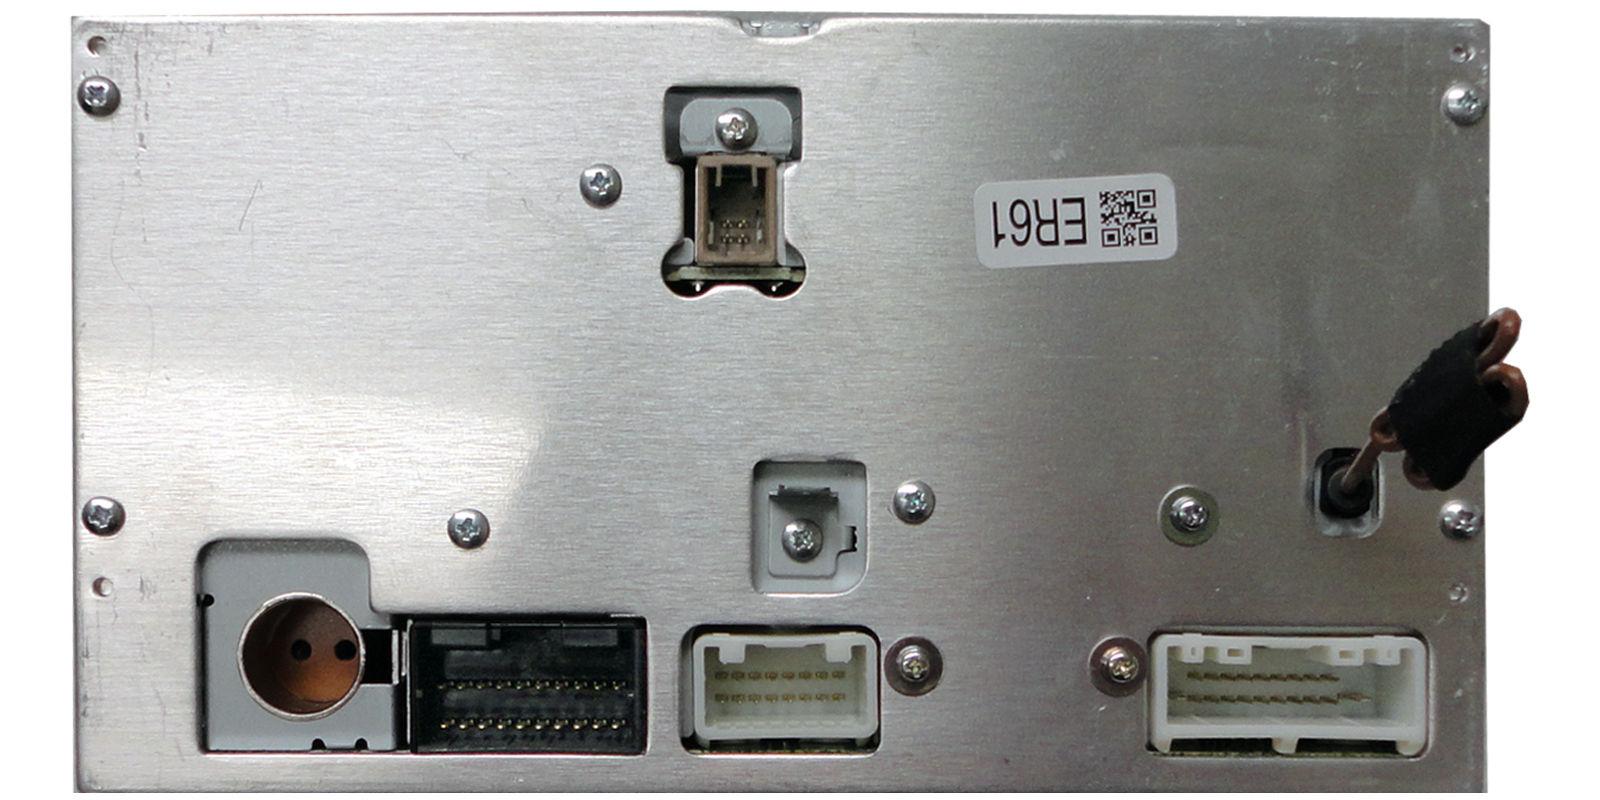 audio upgrade - switch to type b